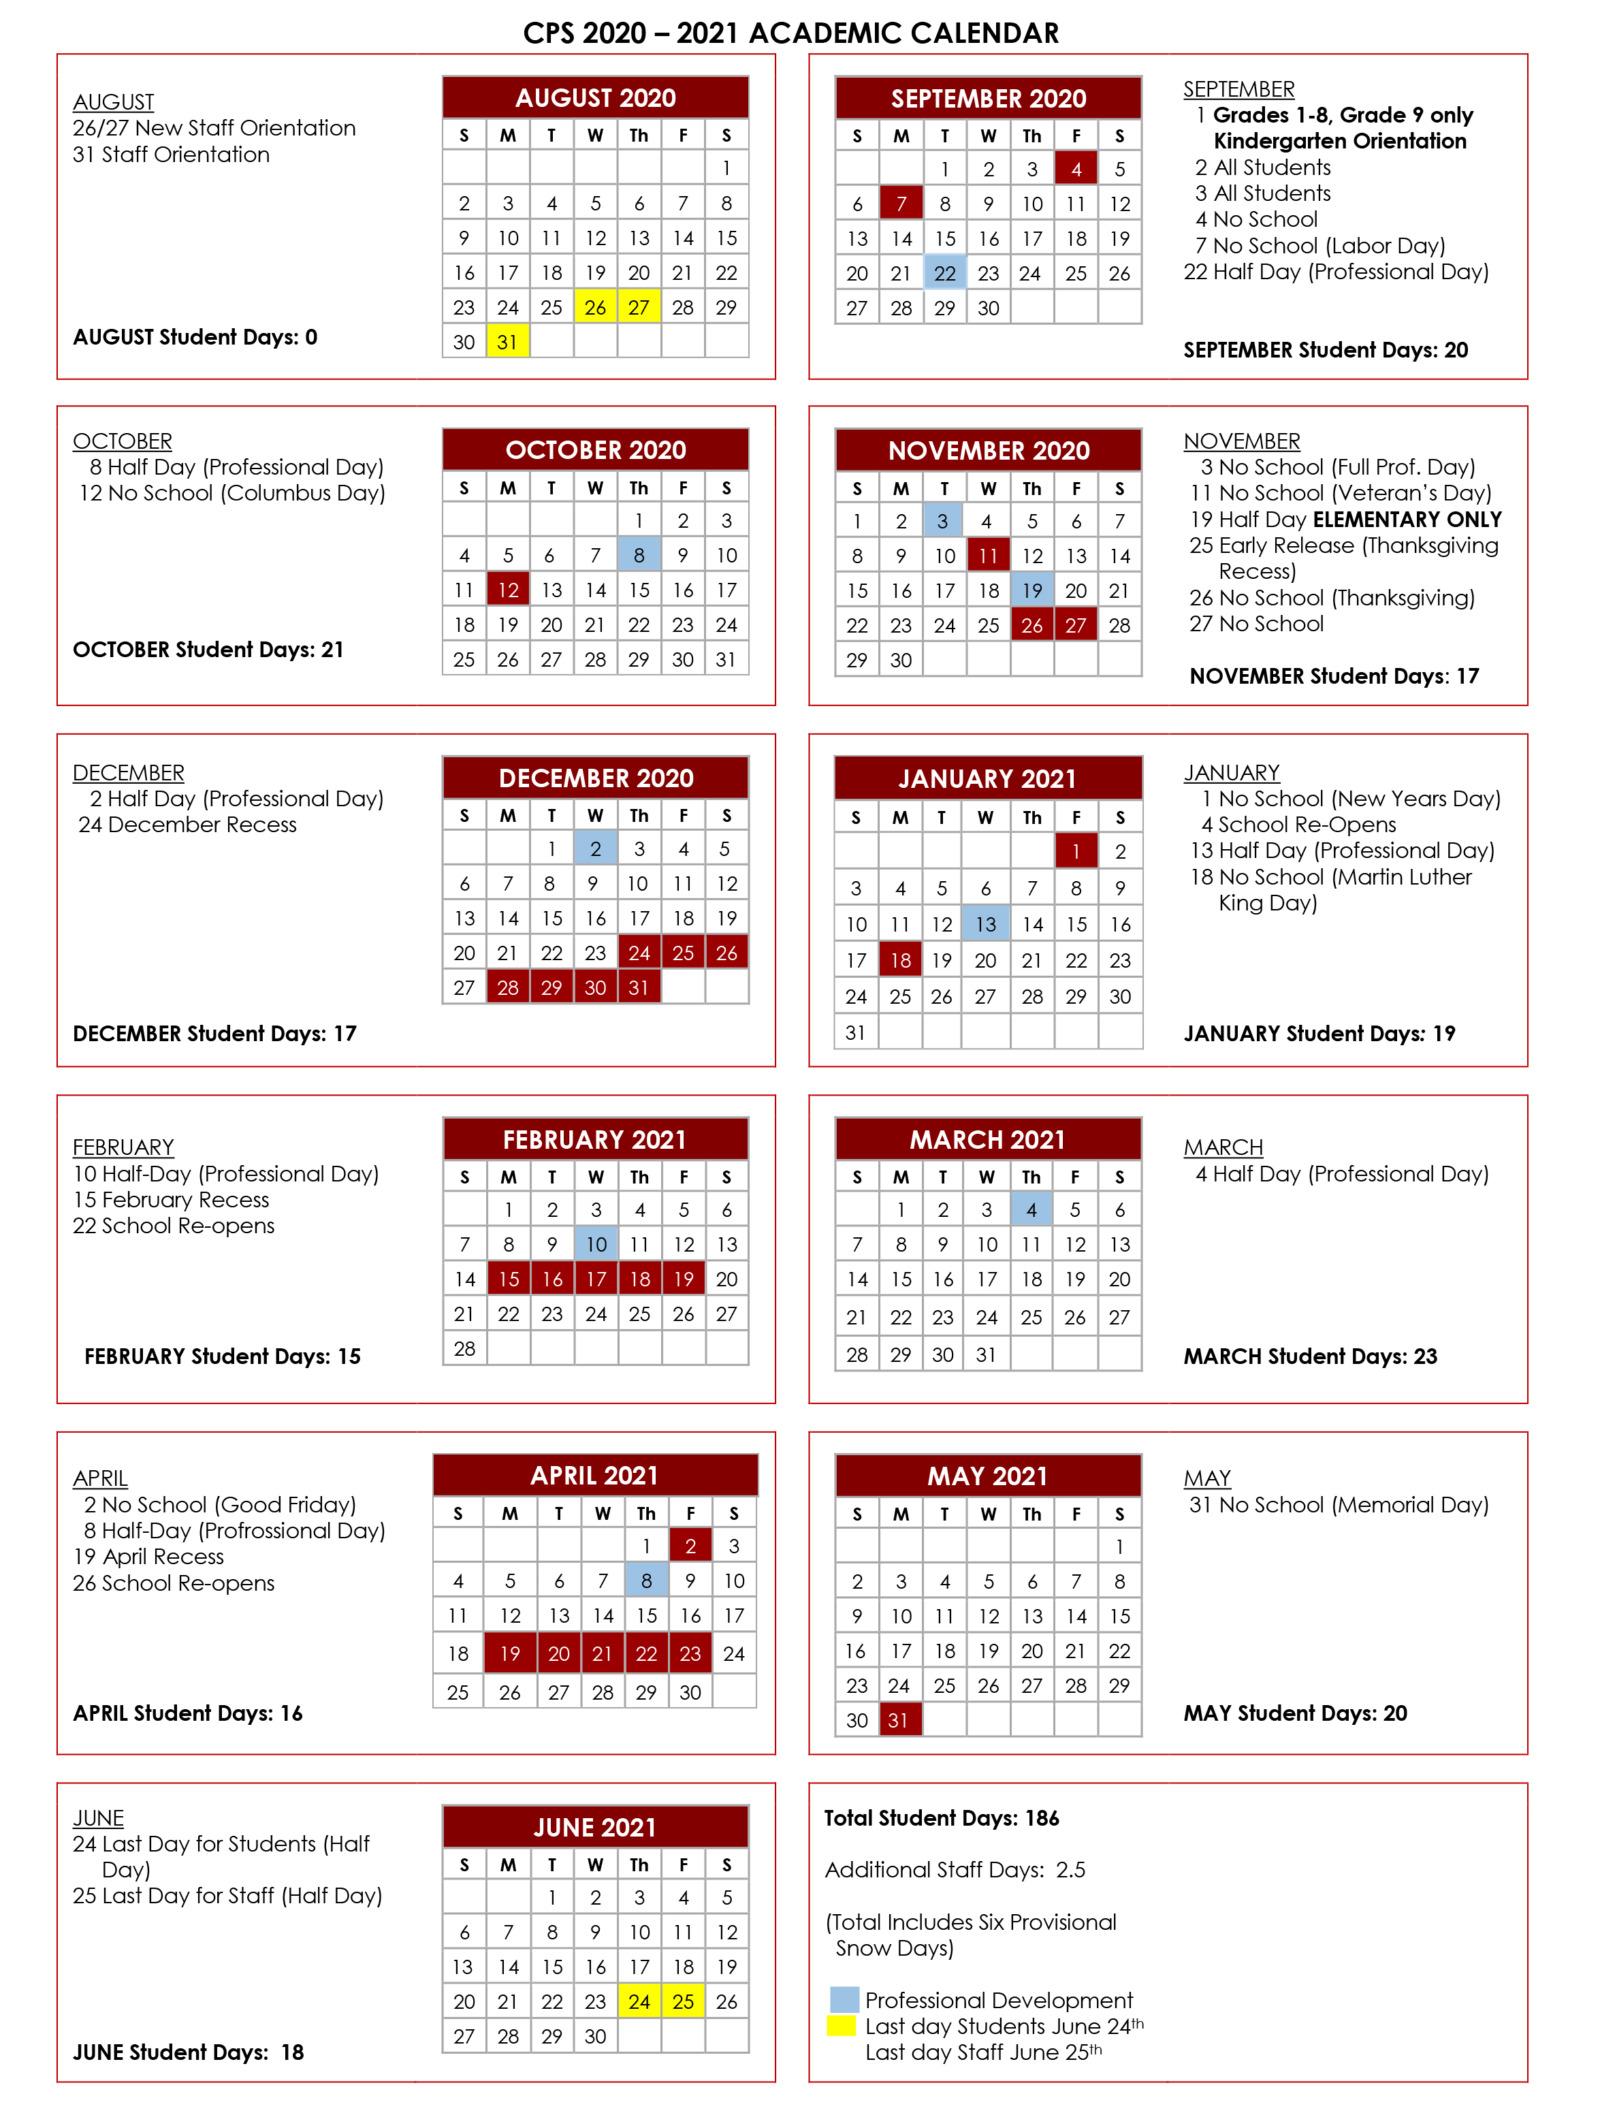 Chelmsford Public Schools Academic Calendar 2020-21-1